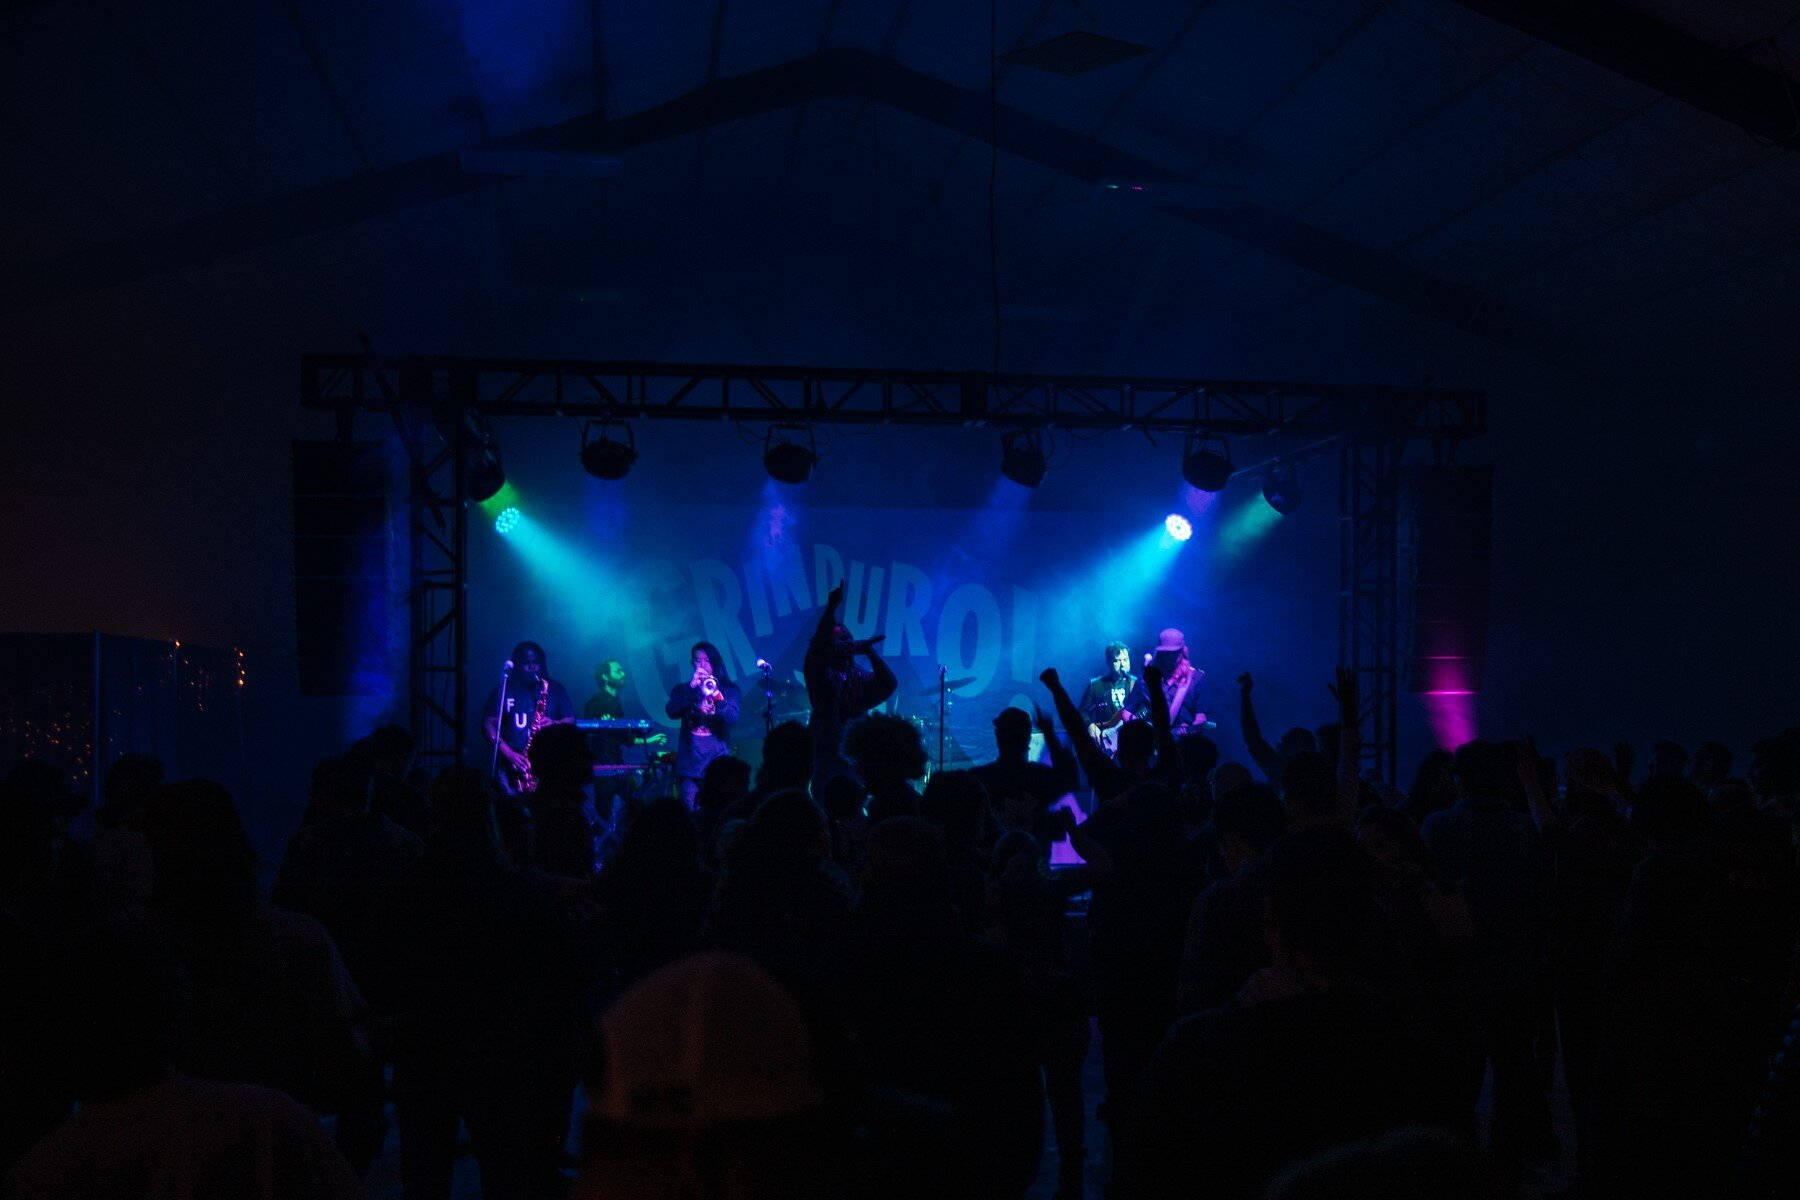 Grinduro 2019 Bike Race Live Music Purple Blue Stage Lights